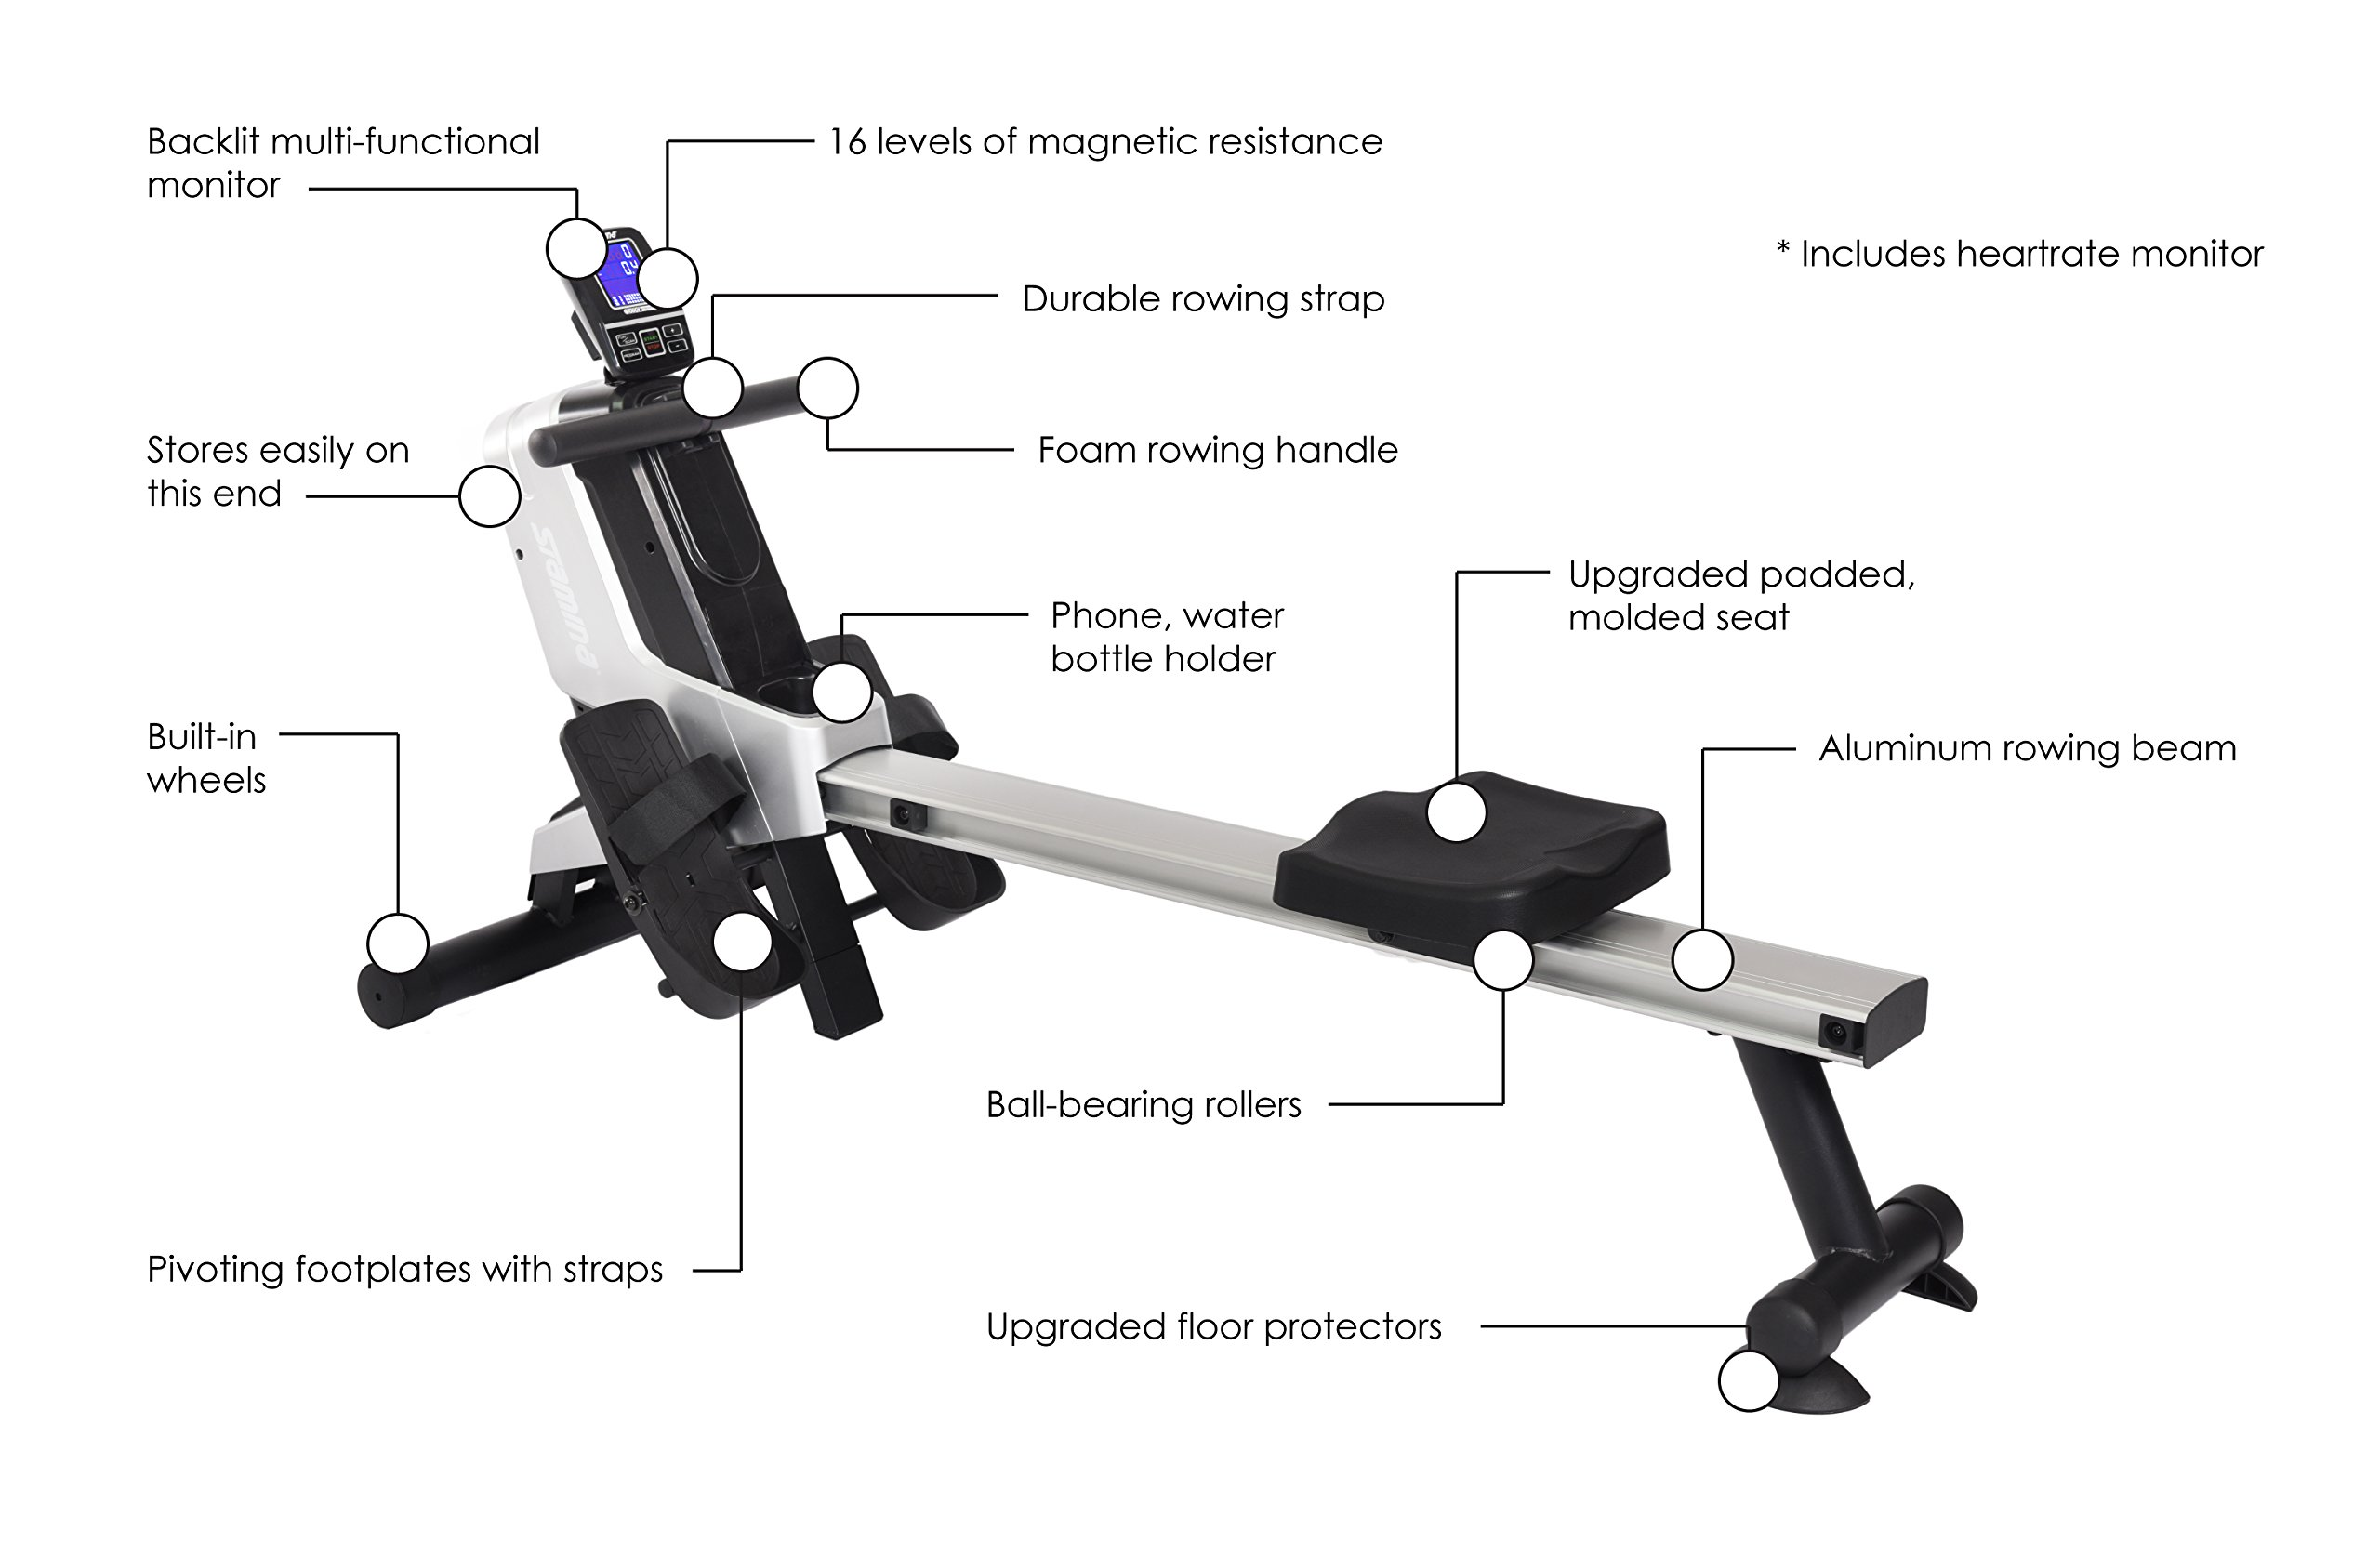 Stamina Magnetic Rowing Machine 1130 by Stamina (Image #2)